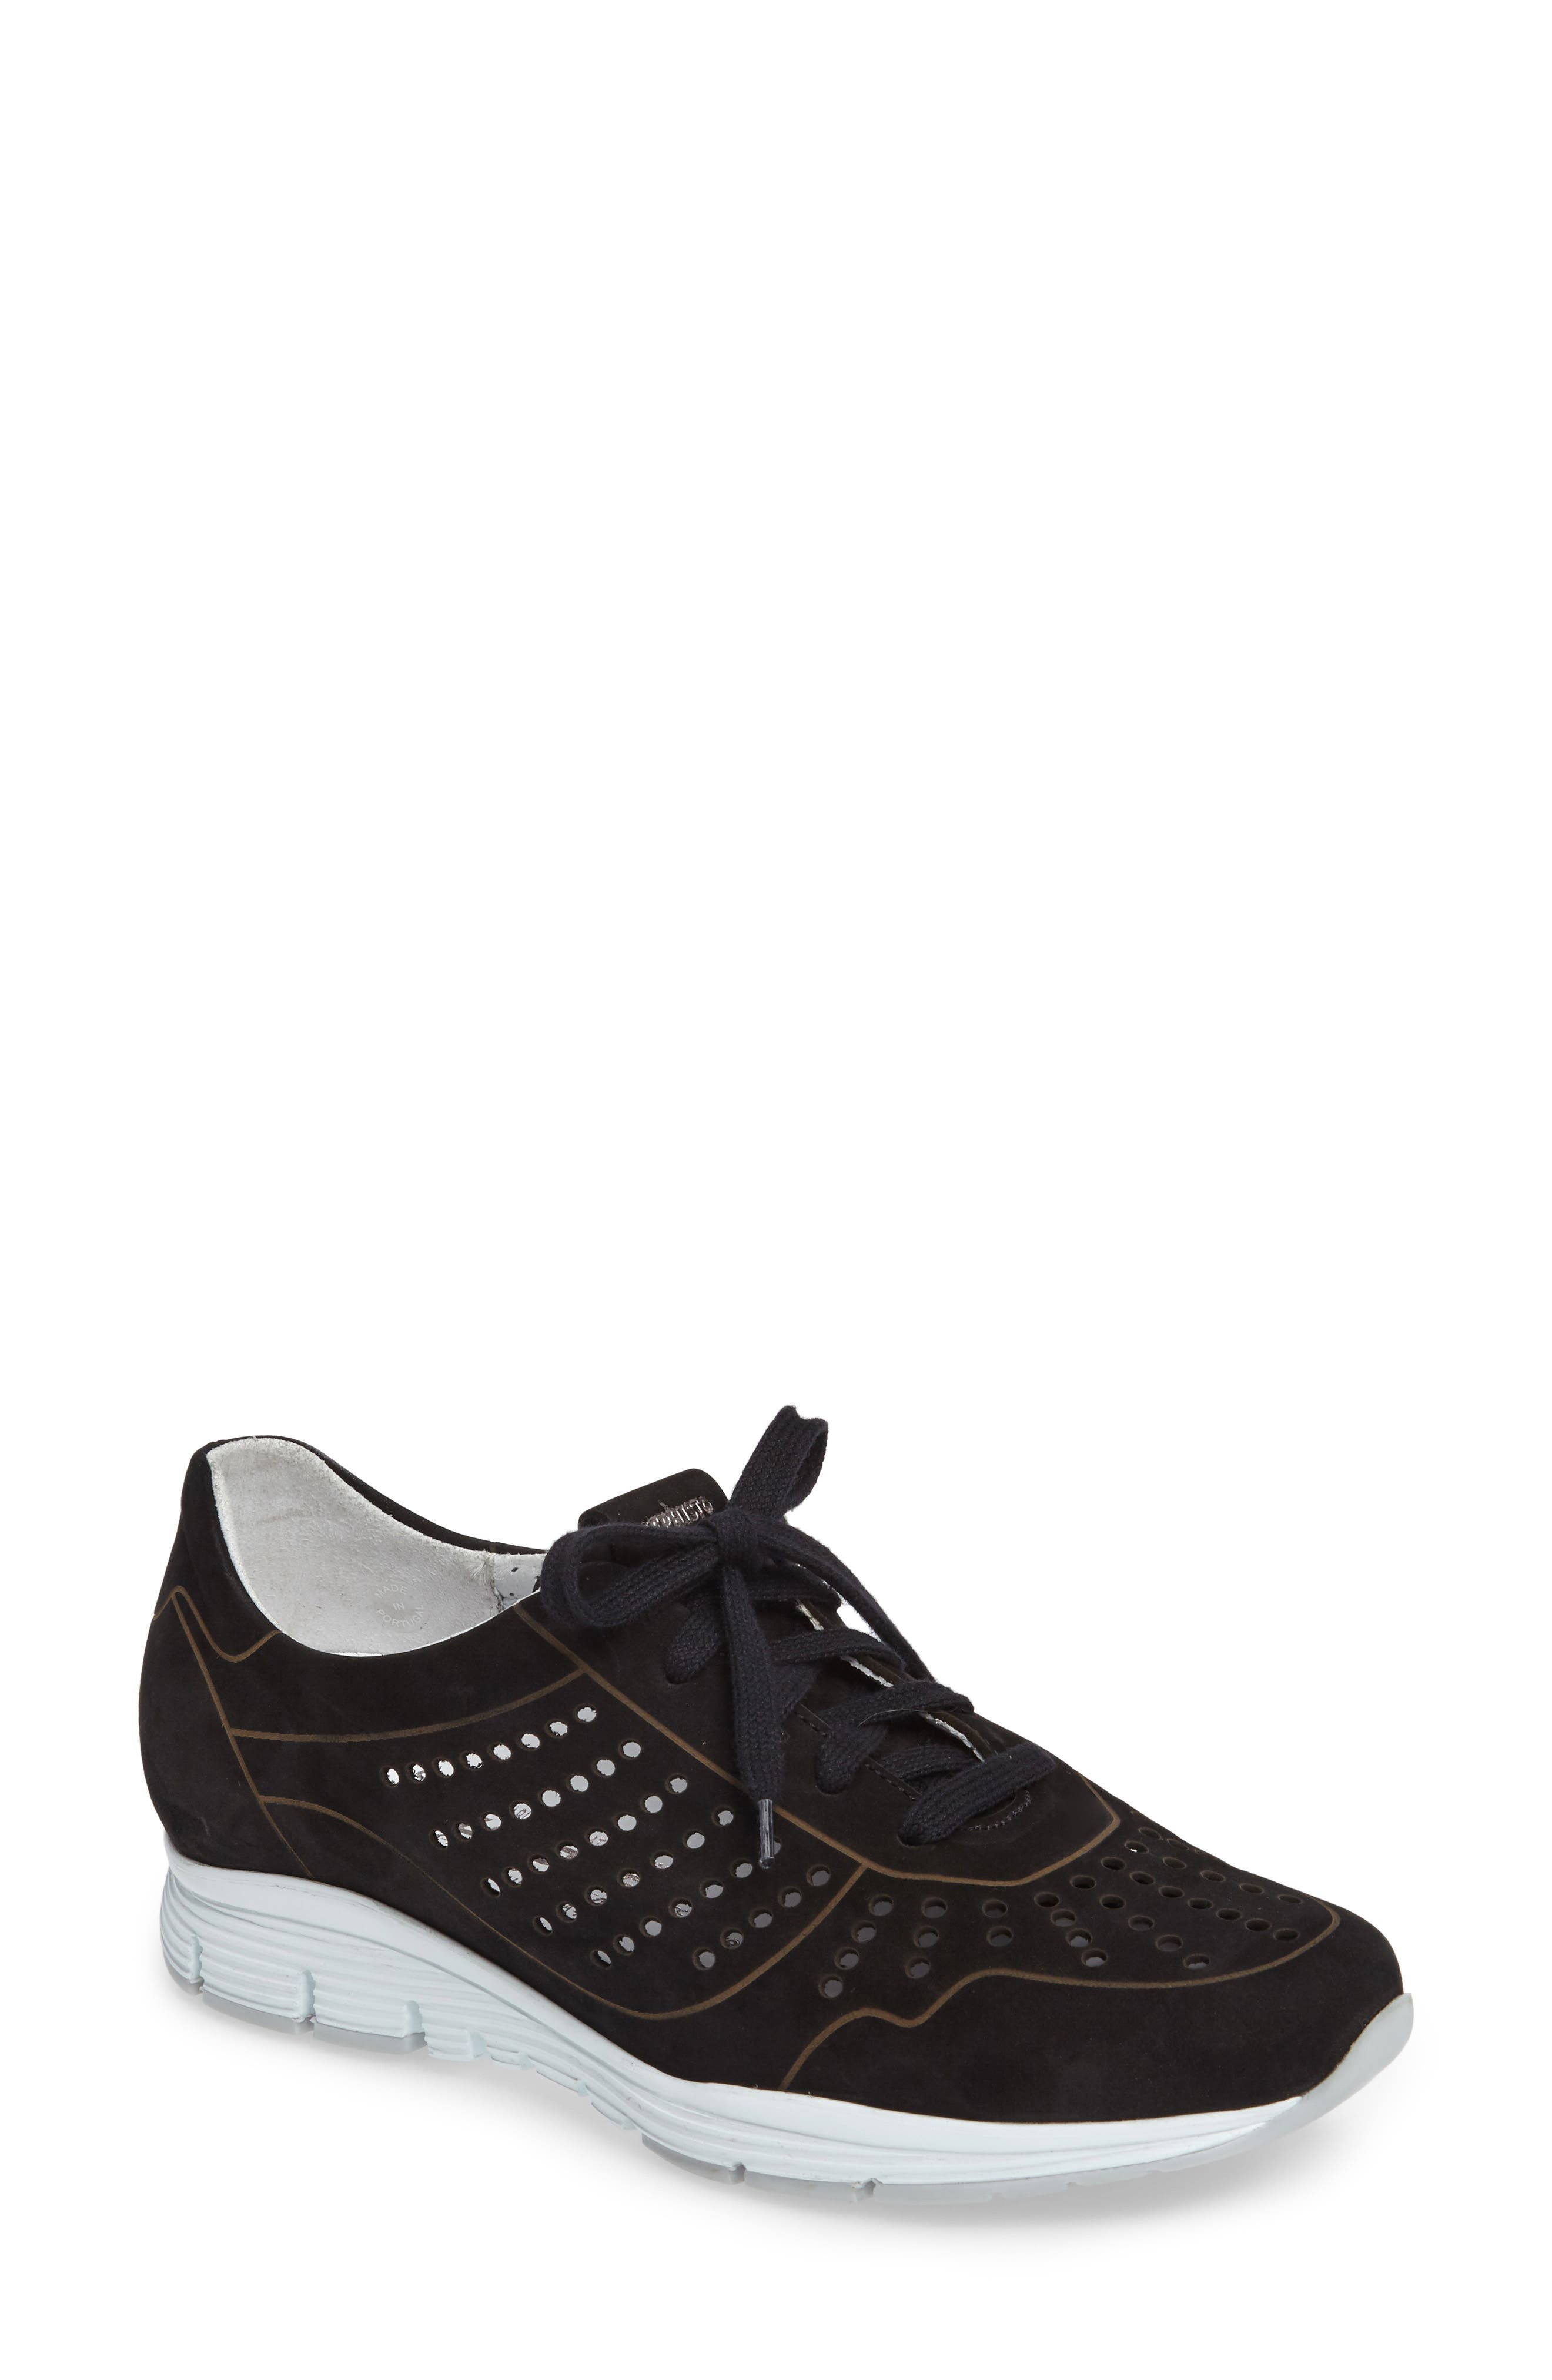 Yliane Sneaker,                             Main thumbnail 1, color,                             Black Nubuck Leather